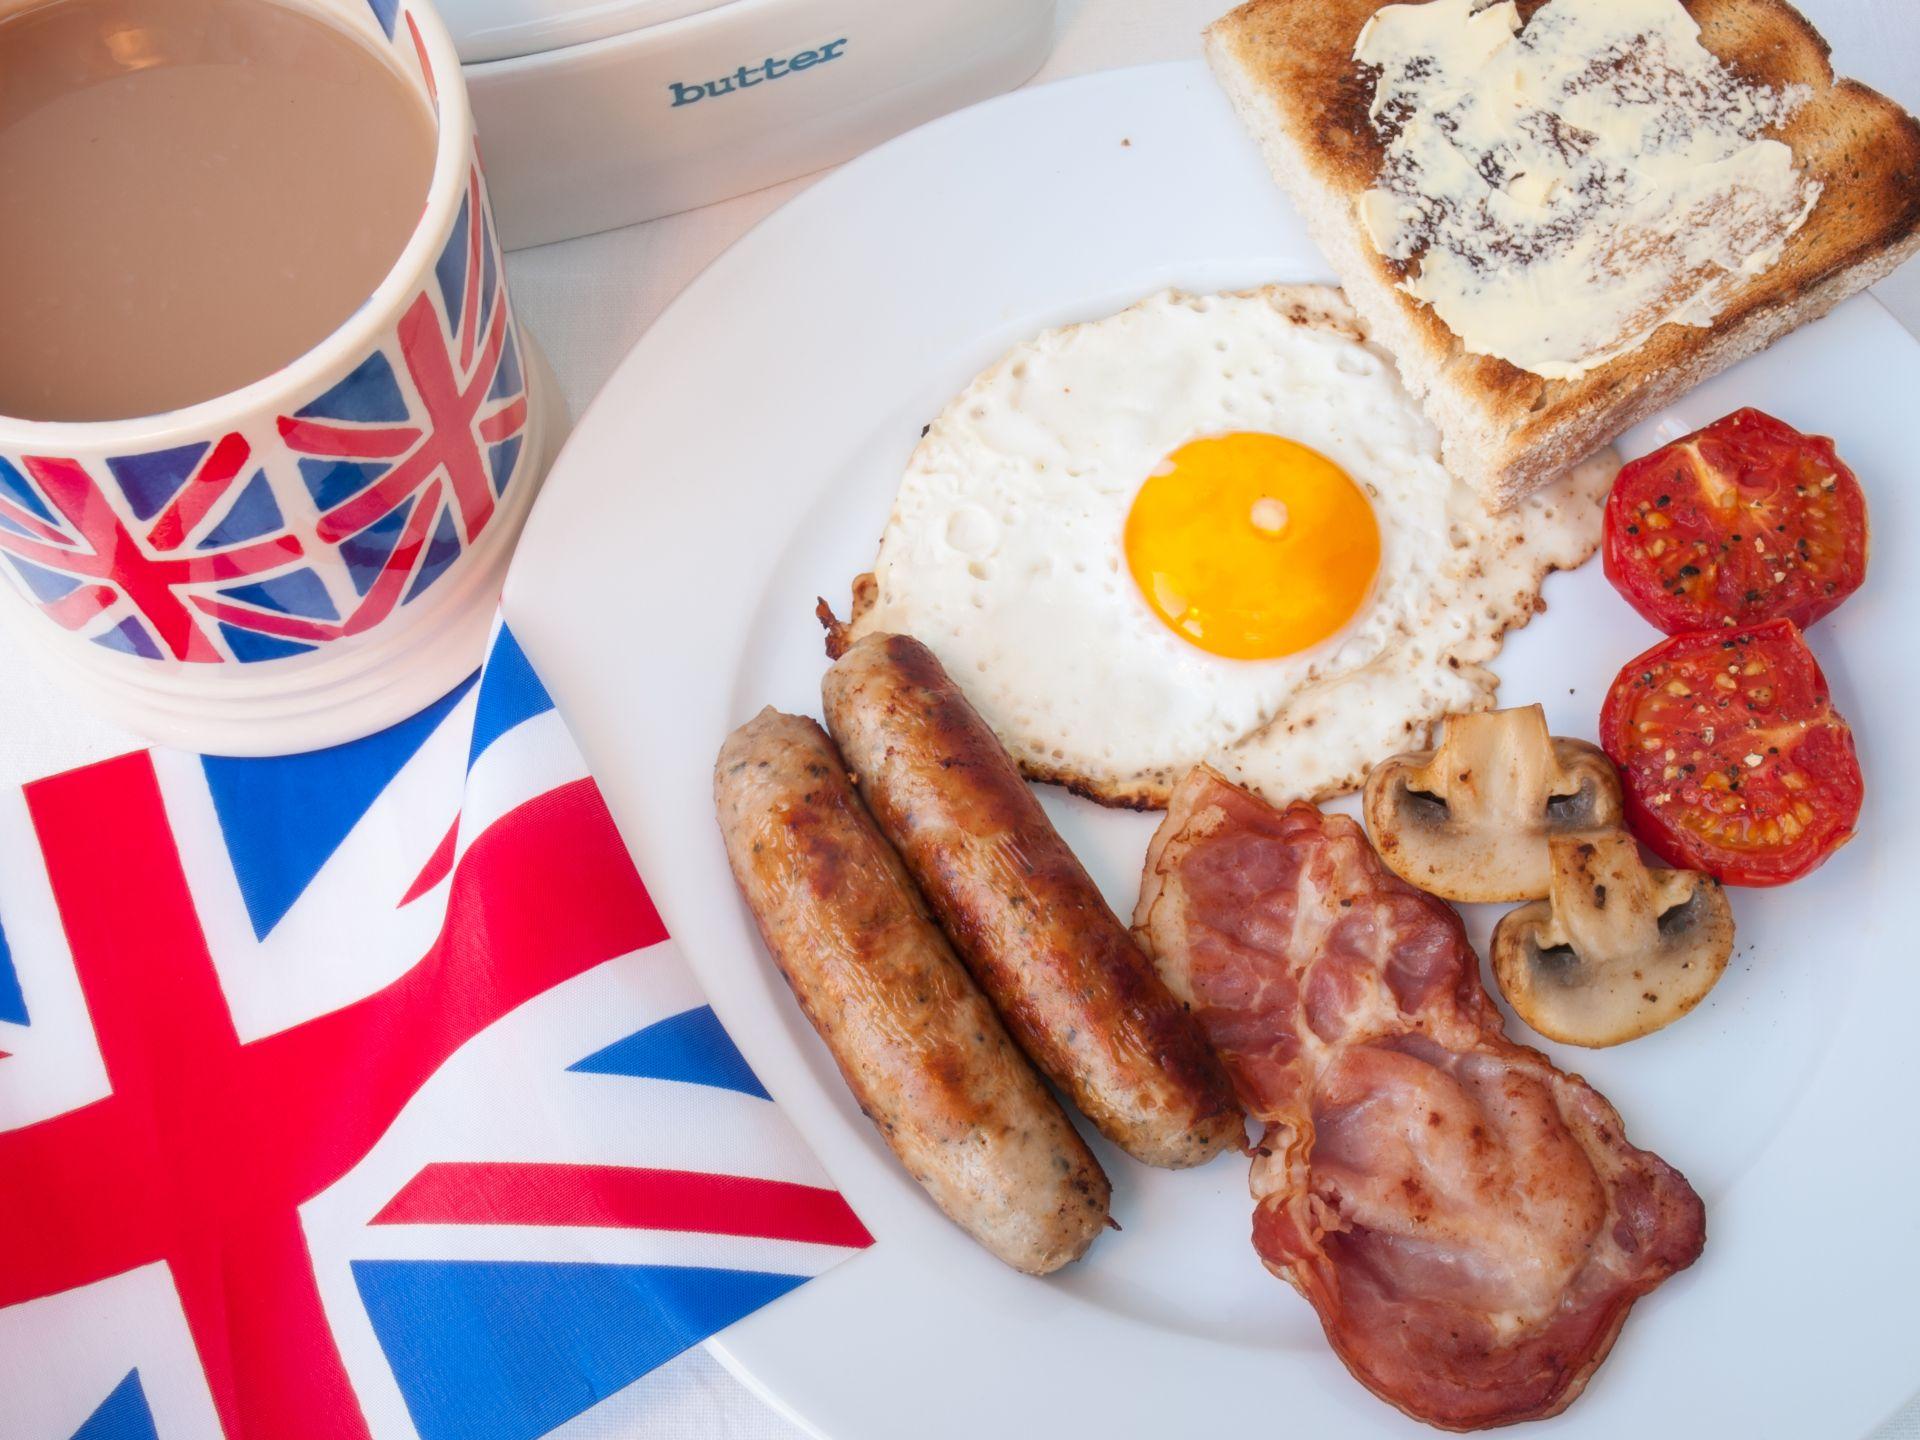 Kuchnia brytyjska healthy or unhealthy? -> Kuchnia Brytyjska Projekt Edukacyjny